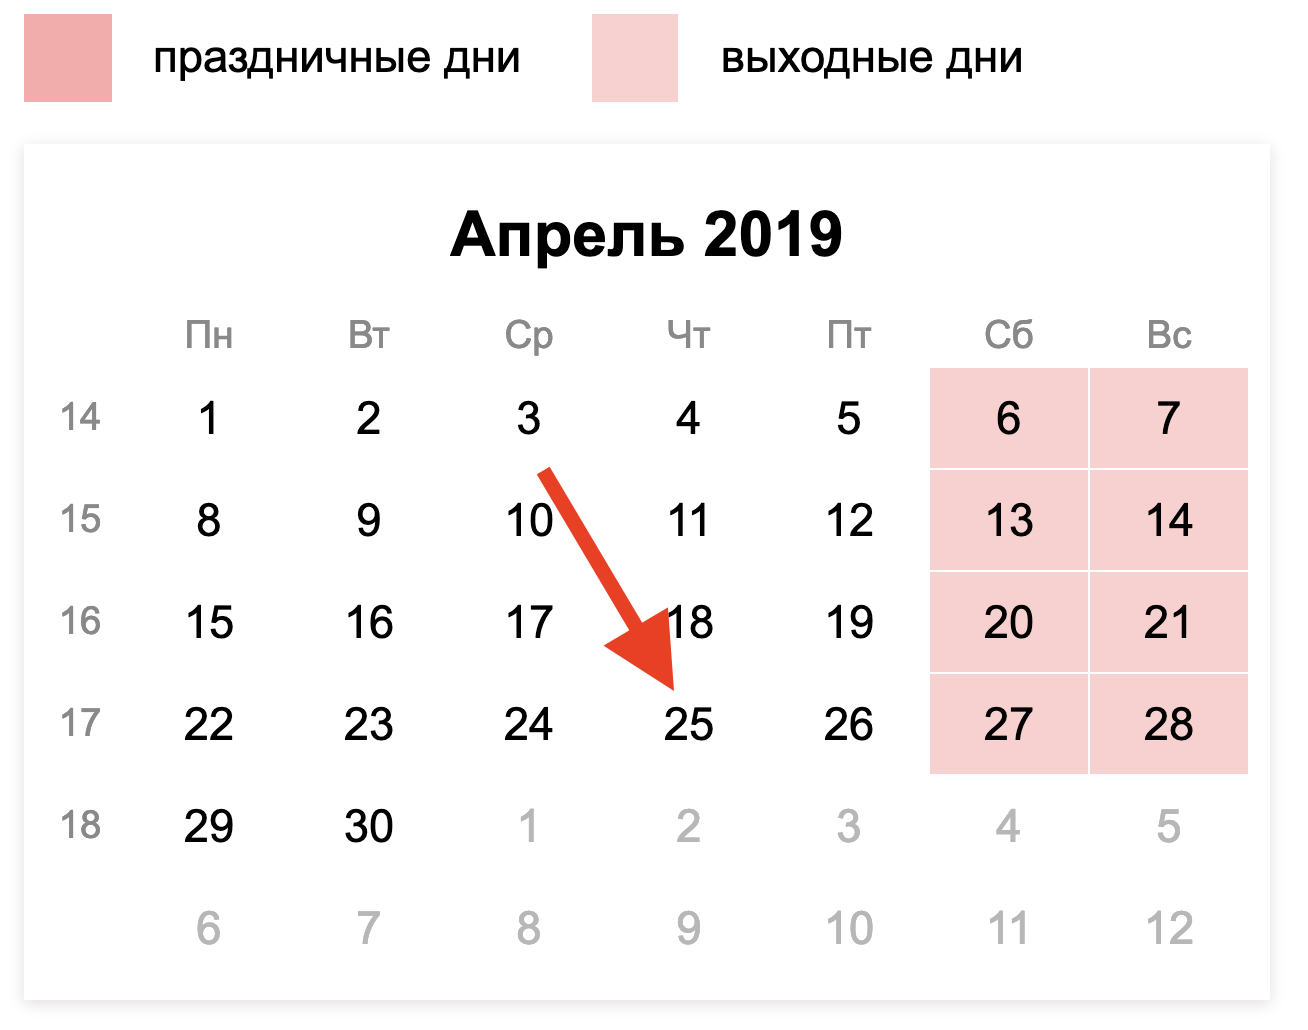 Форма декларации по НДС за 1 квартал 2019 года: образец заполнения